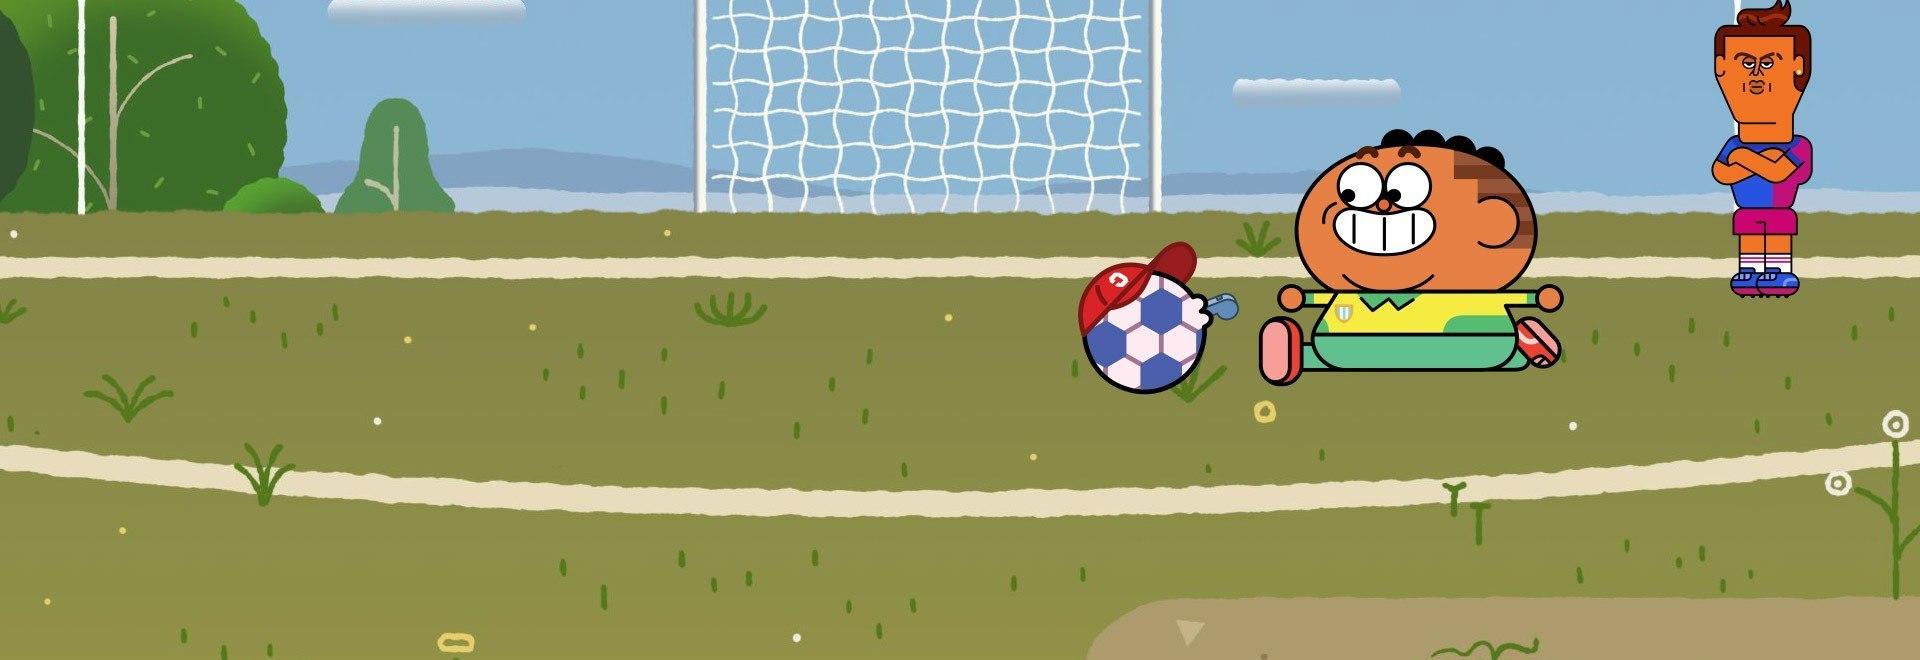 Mini pallone - Maxi papà